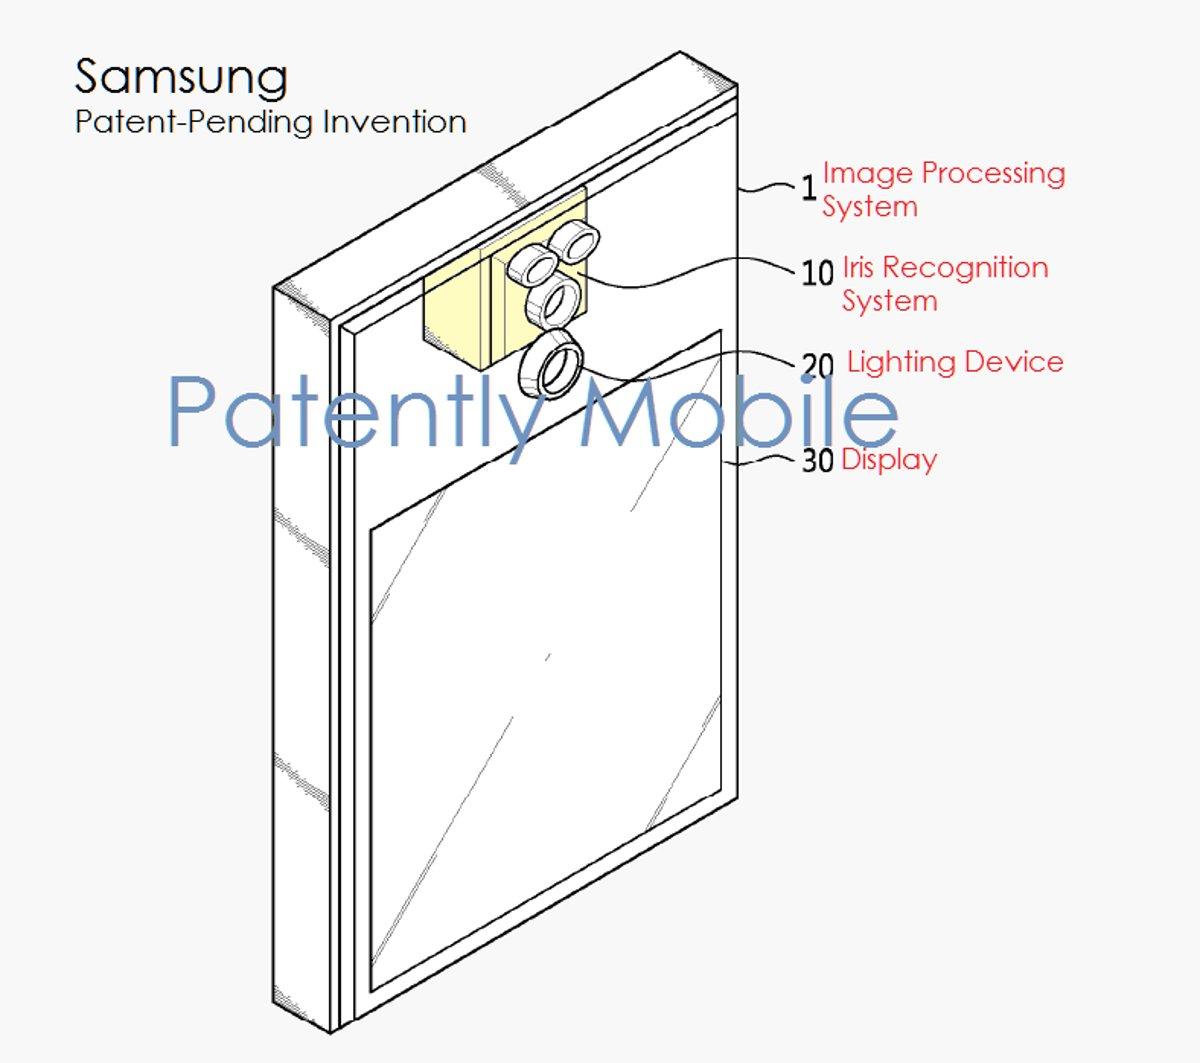 Samsung Iris Scanner Lens Setup - Patent